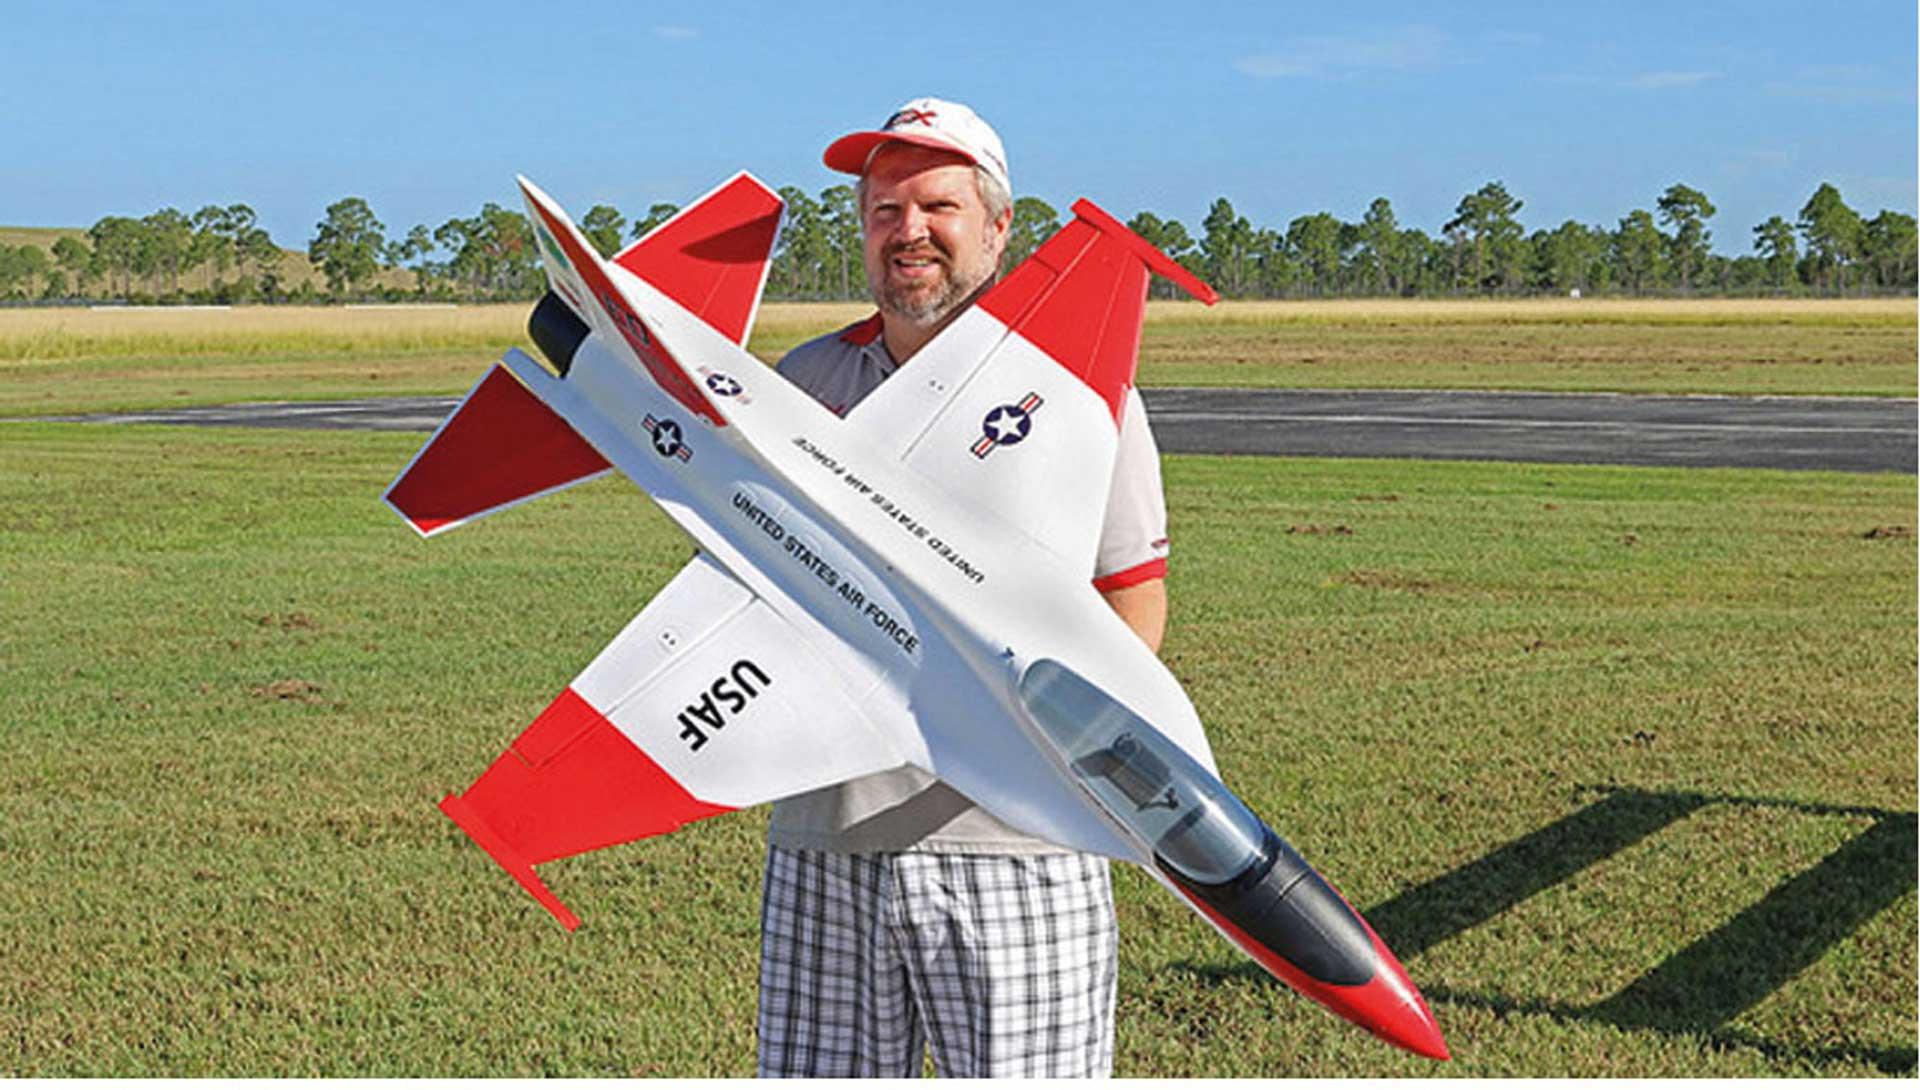 PREMIER AIRCRAFT FLEXJET 90MM EDF IMPELLER JET SUPER PNP WITH AURA 8 AFCS